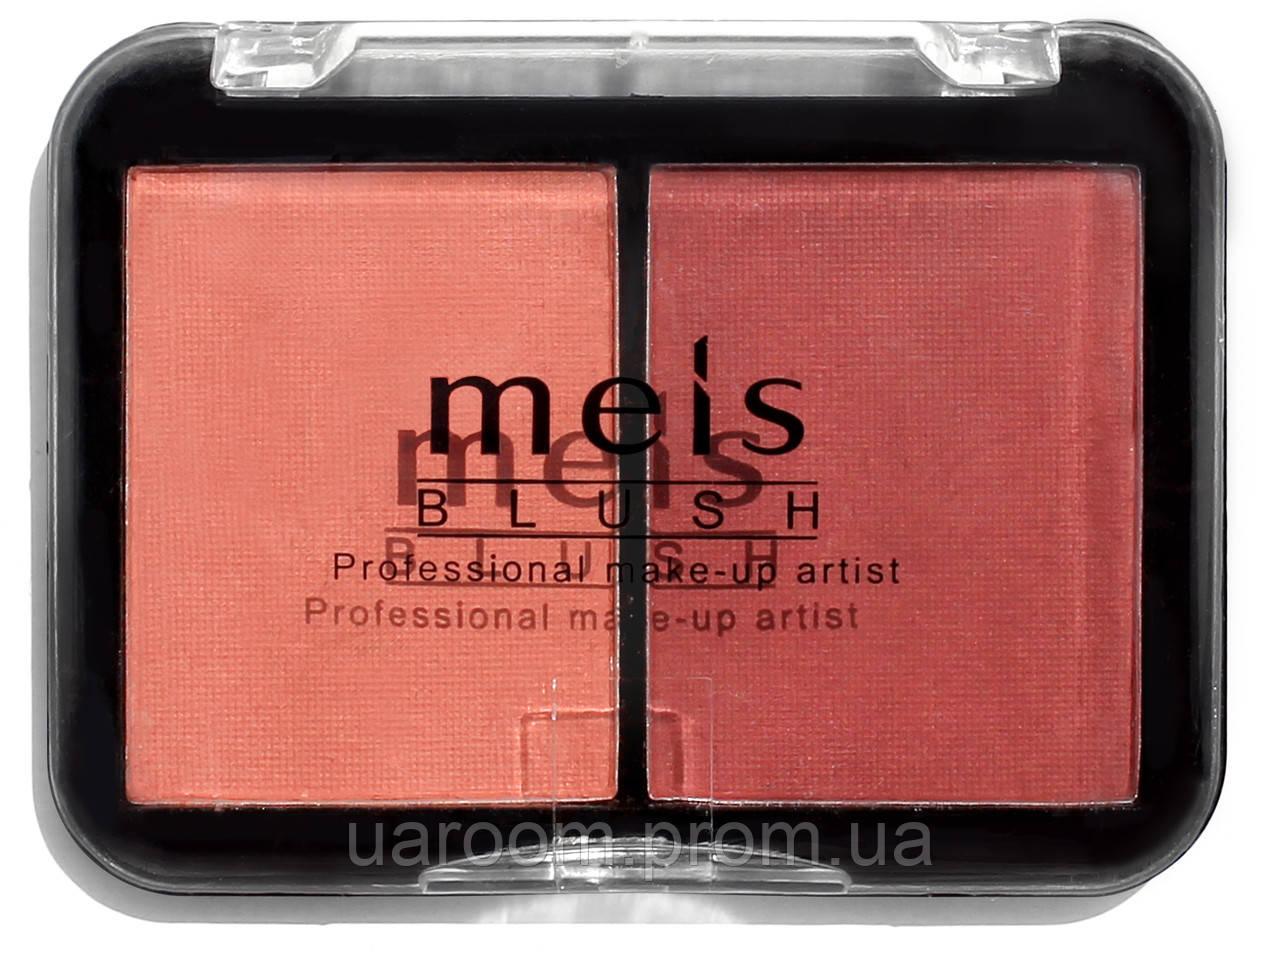 Подвійні компактні рум'яна Meis professional make-up artist MS0238